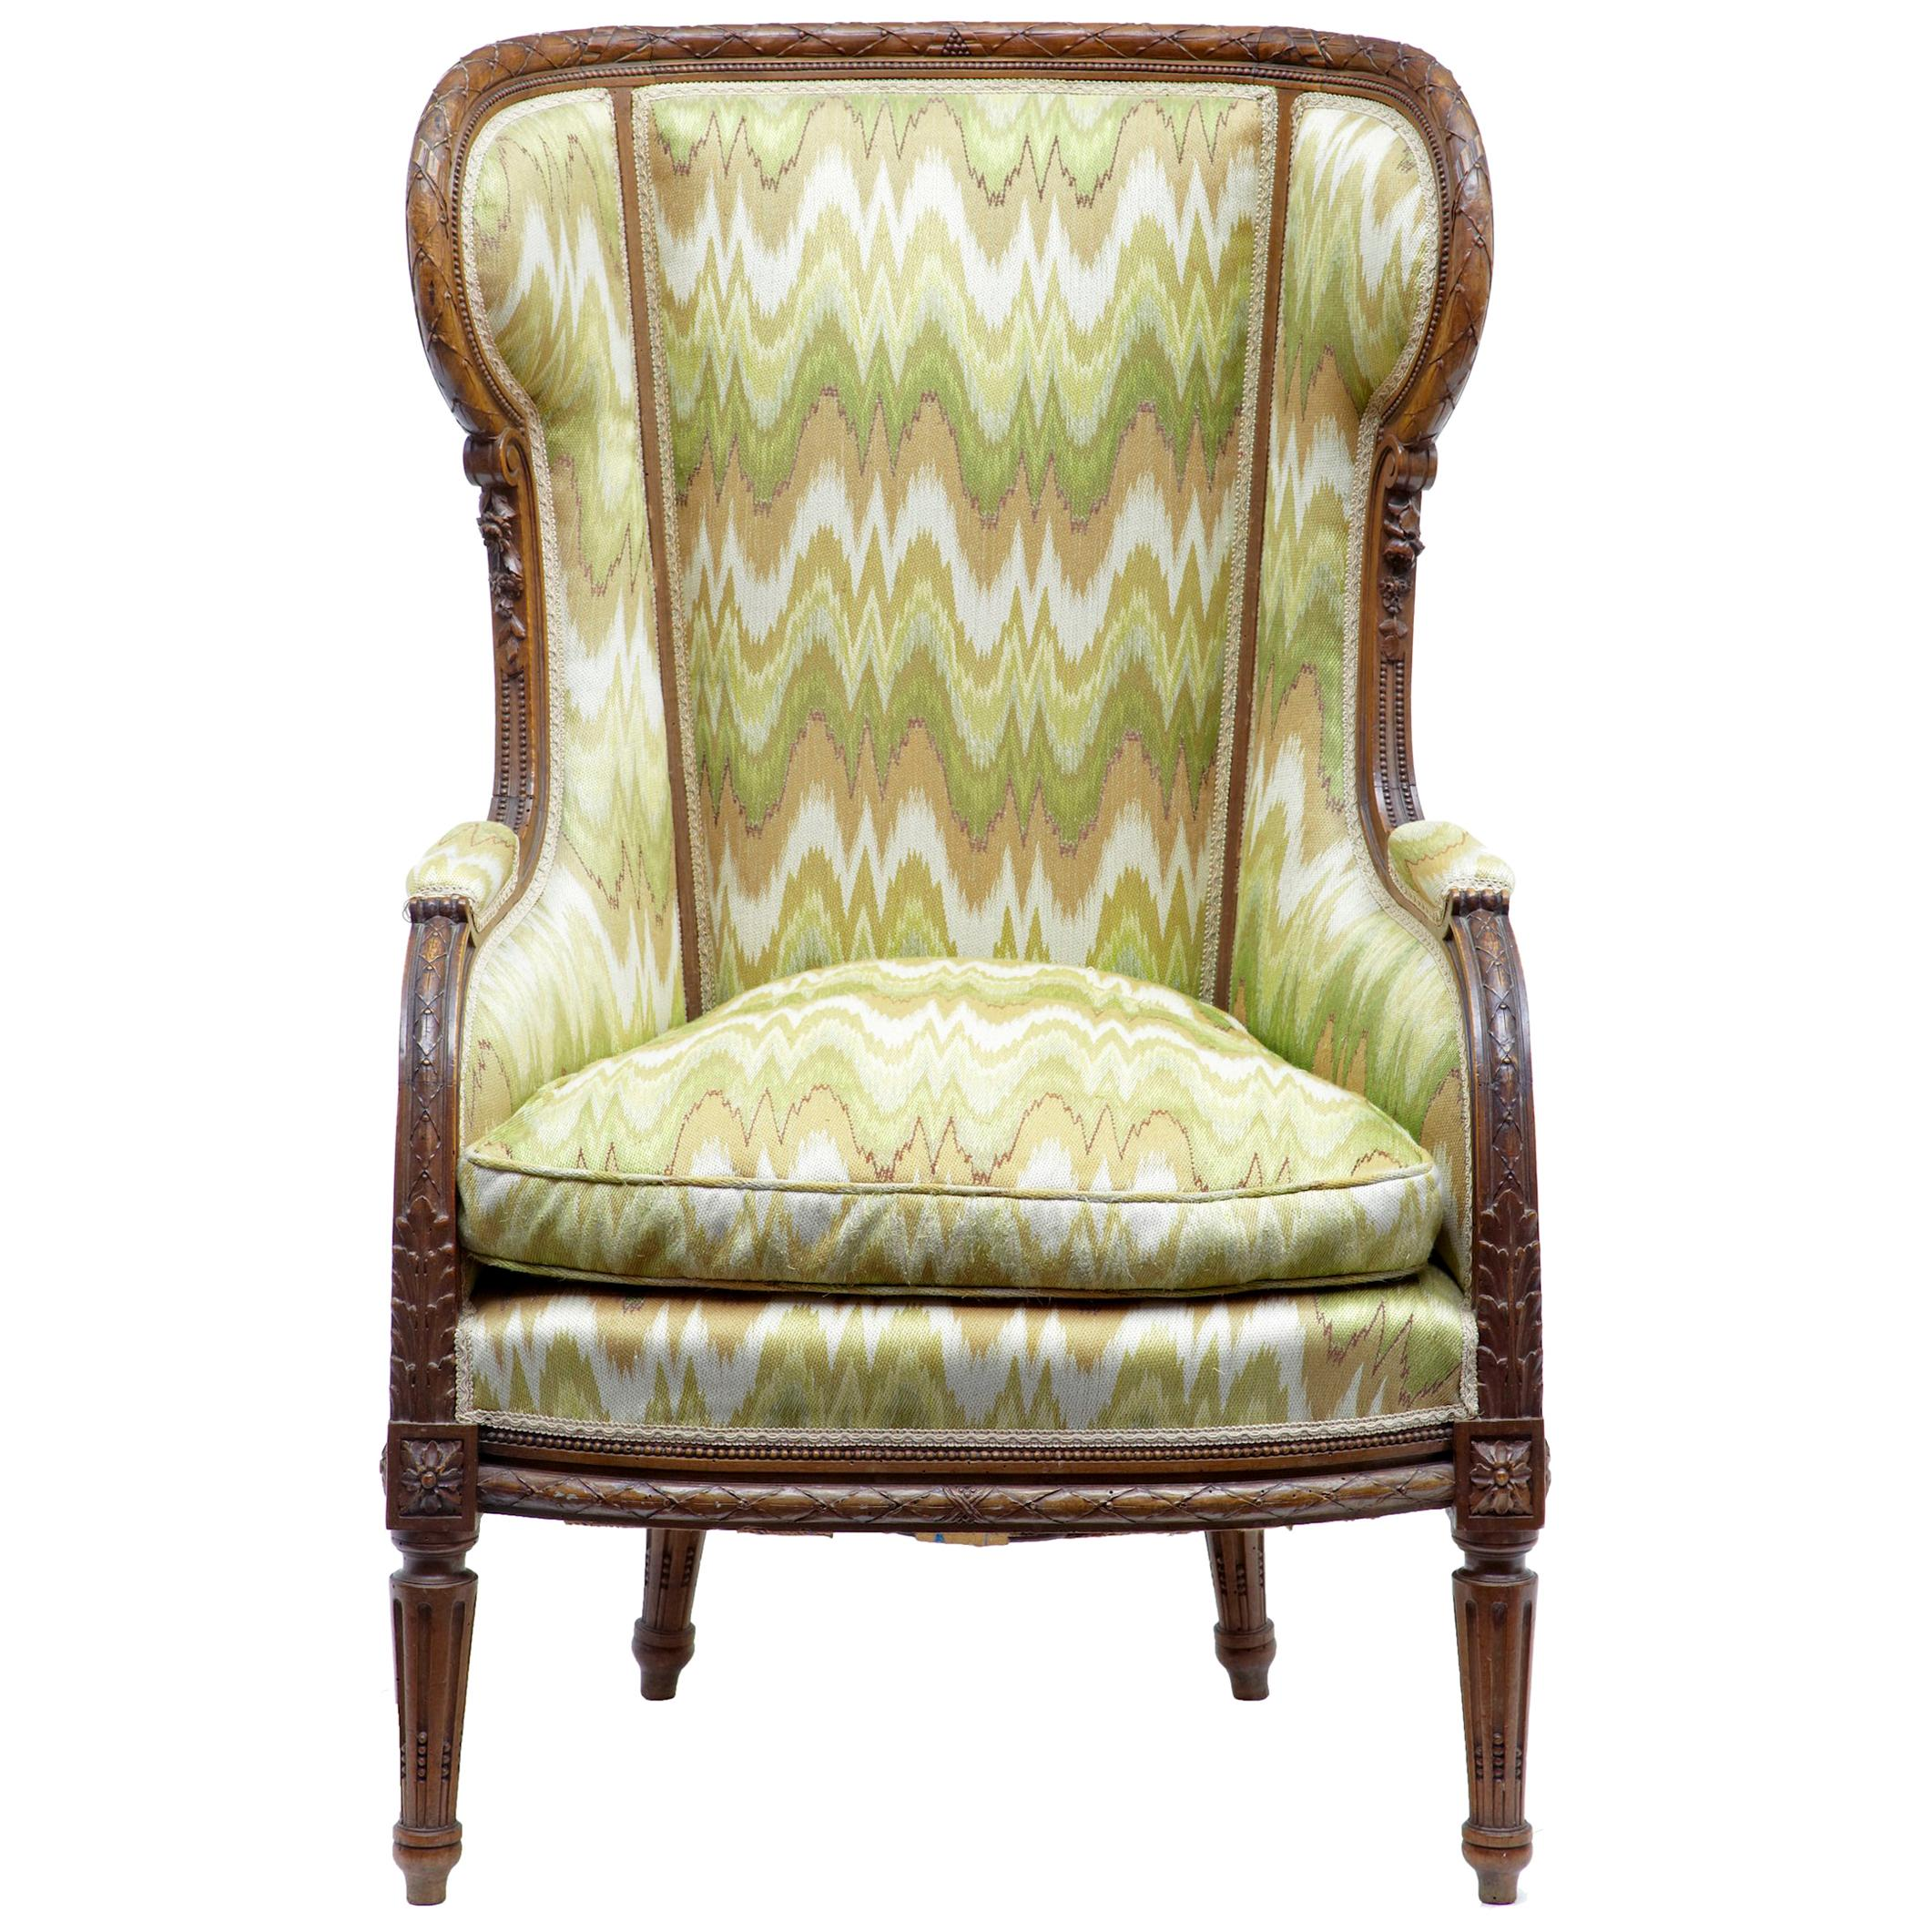 19th Century French Walnut Wingback Armchair